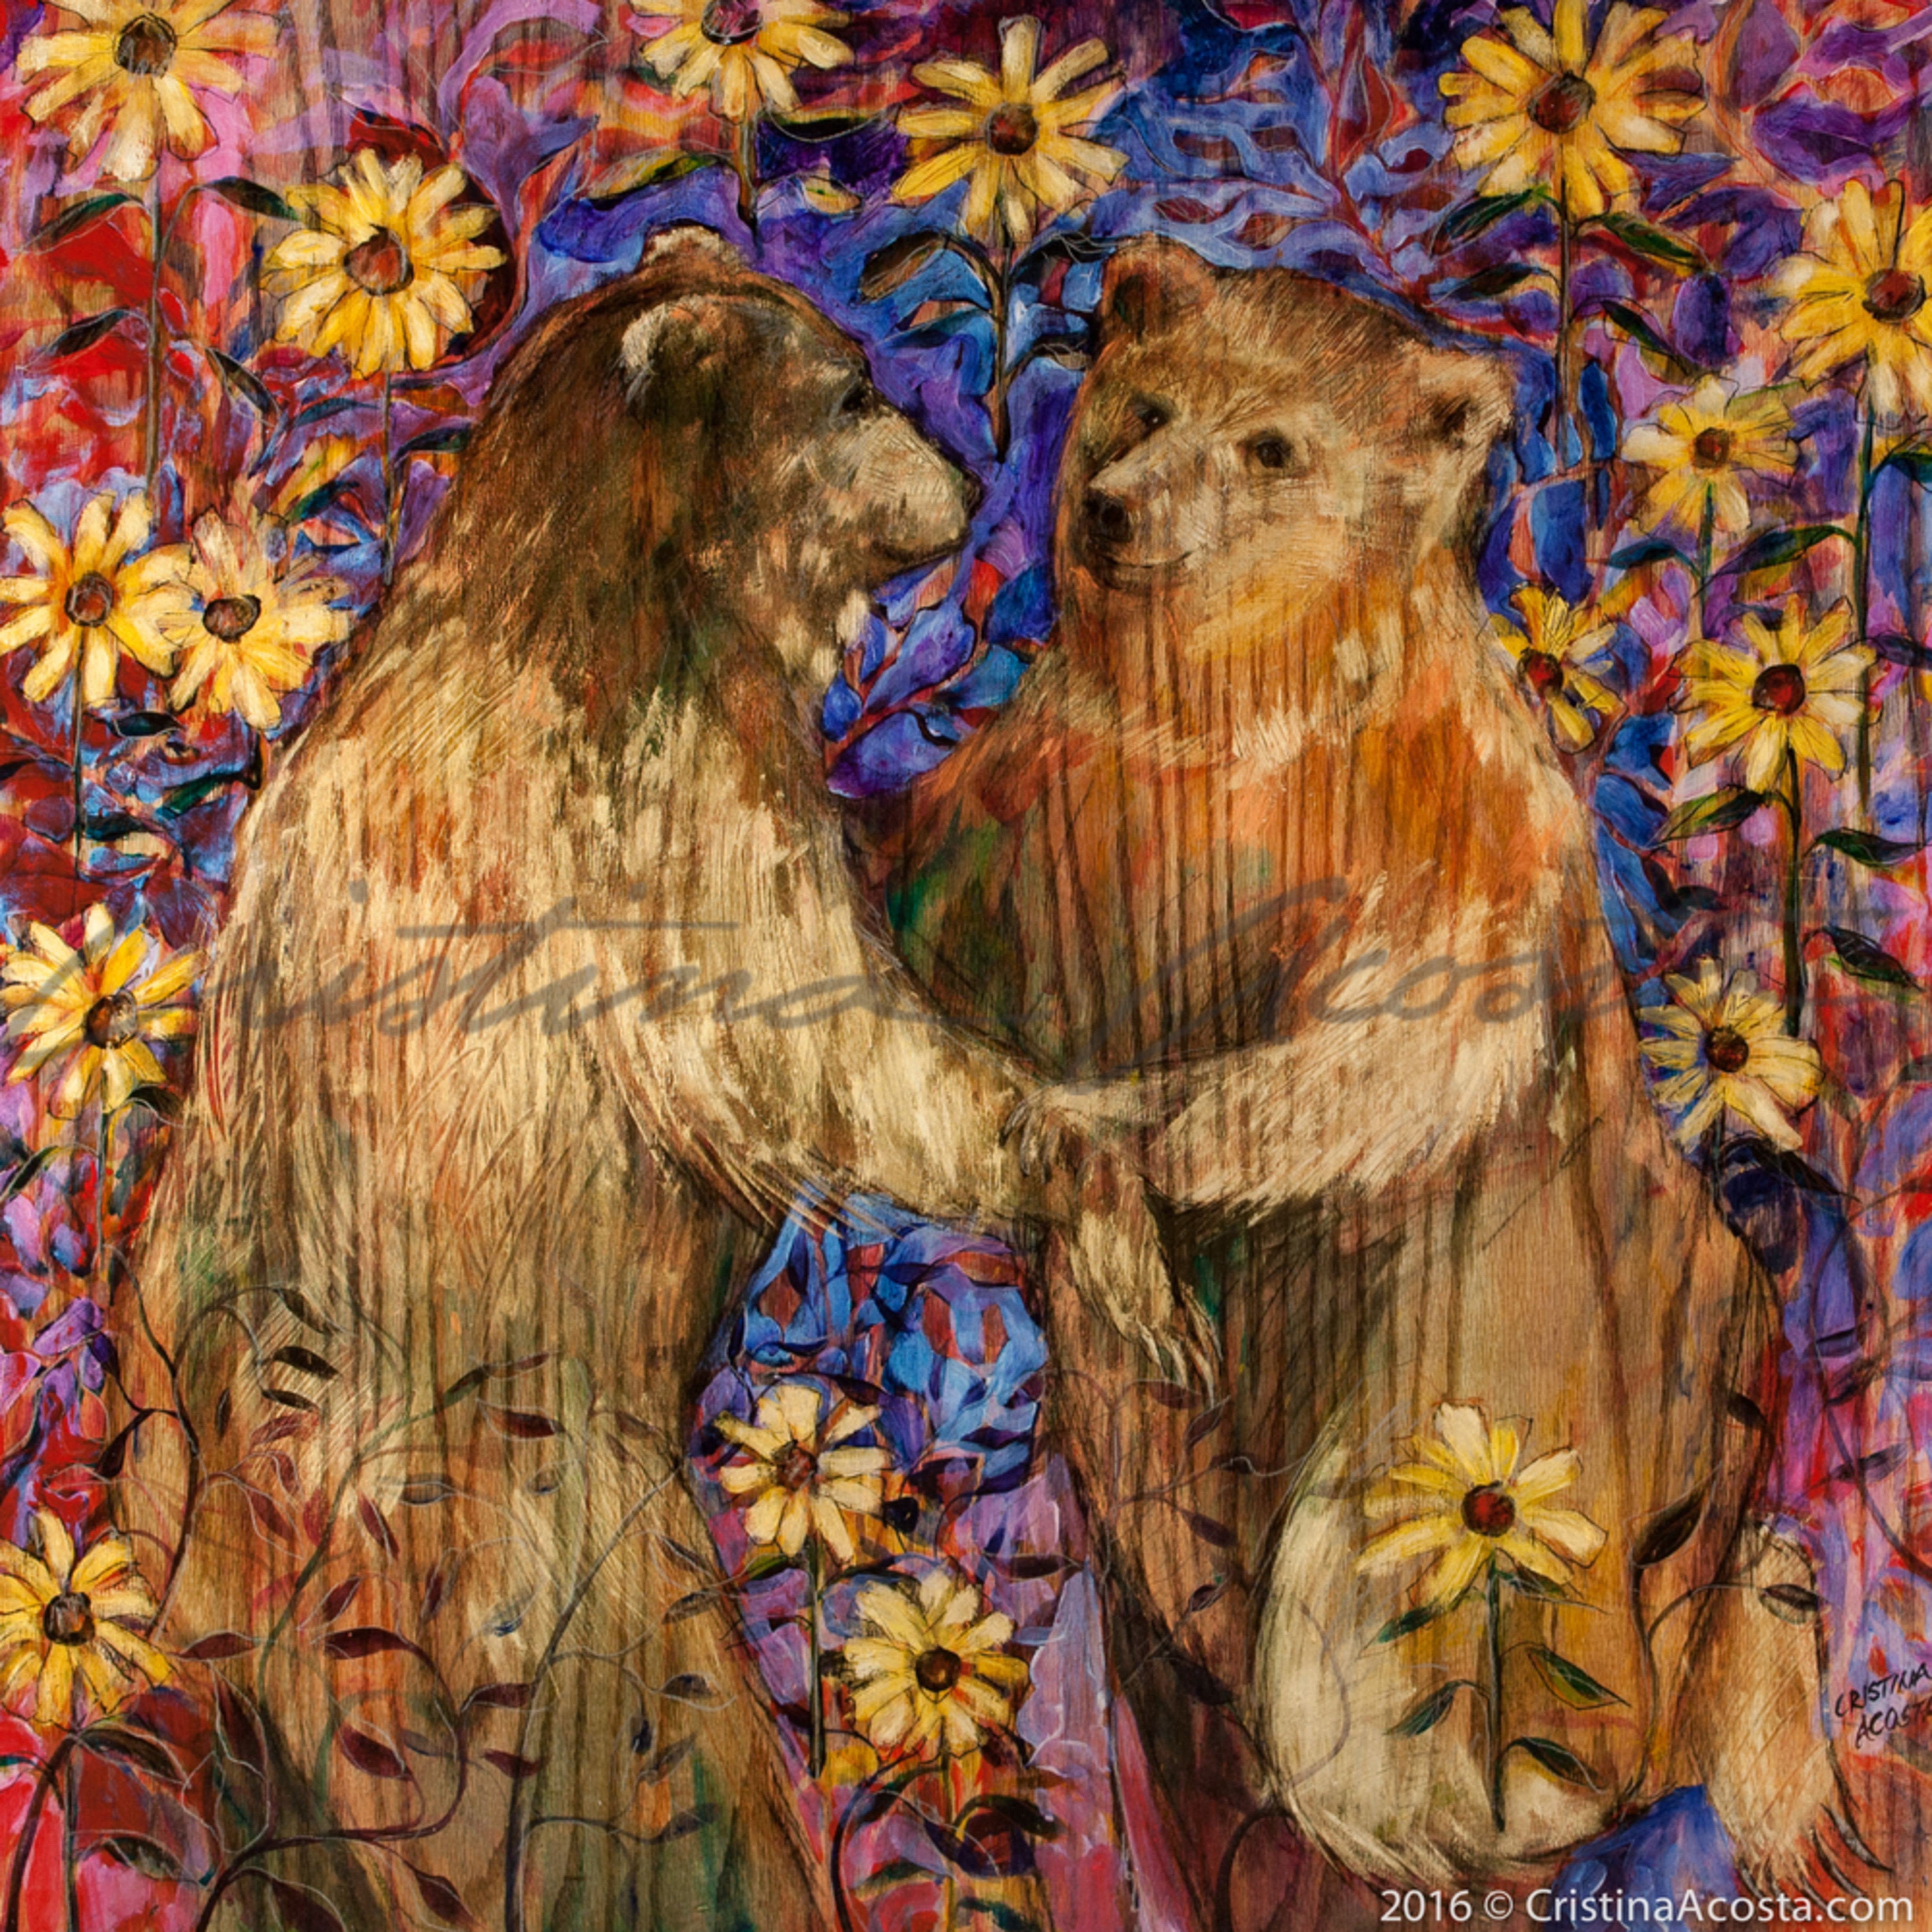 Bears in love dancing in mules ear flower field uuiaim